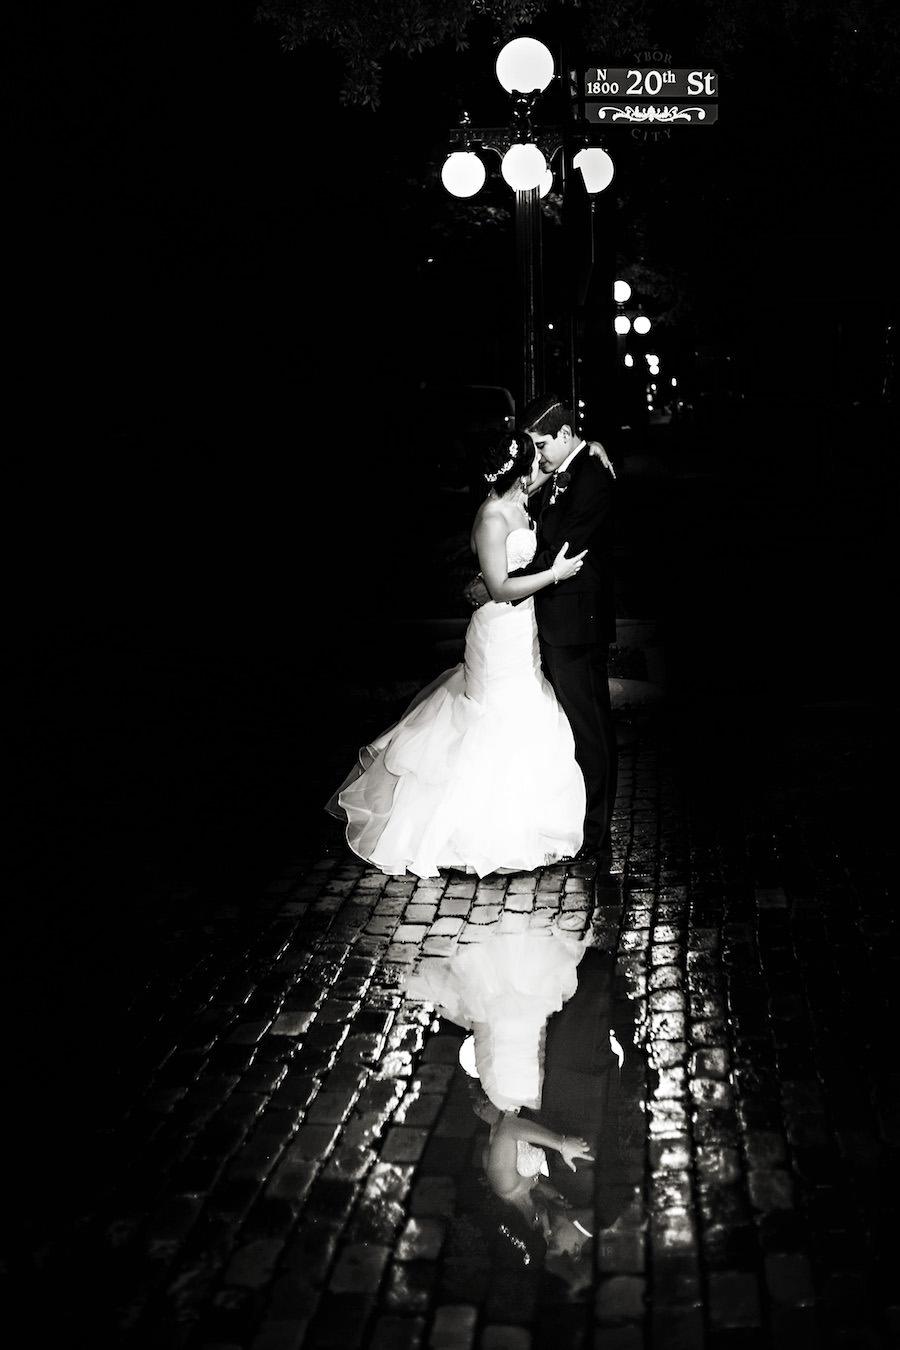 Outdoor, Nighttime Bride and Groom Wedding Portrait on Brick Road